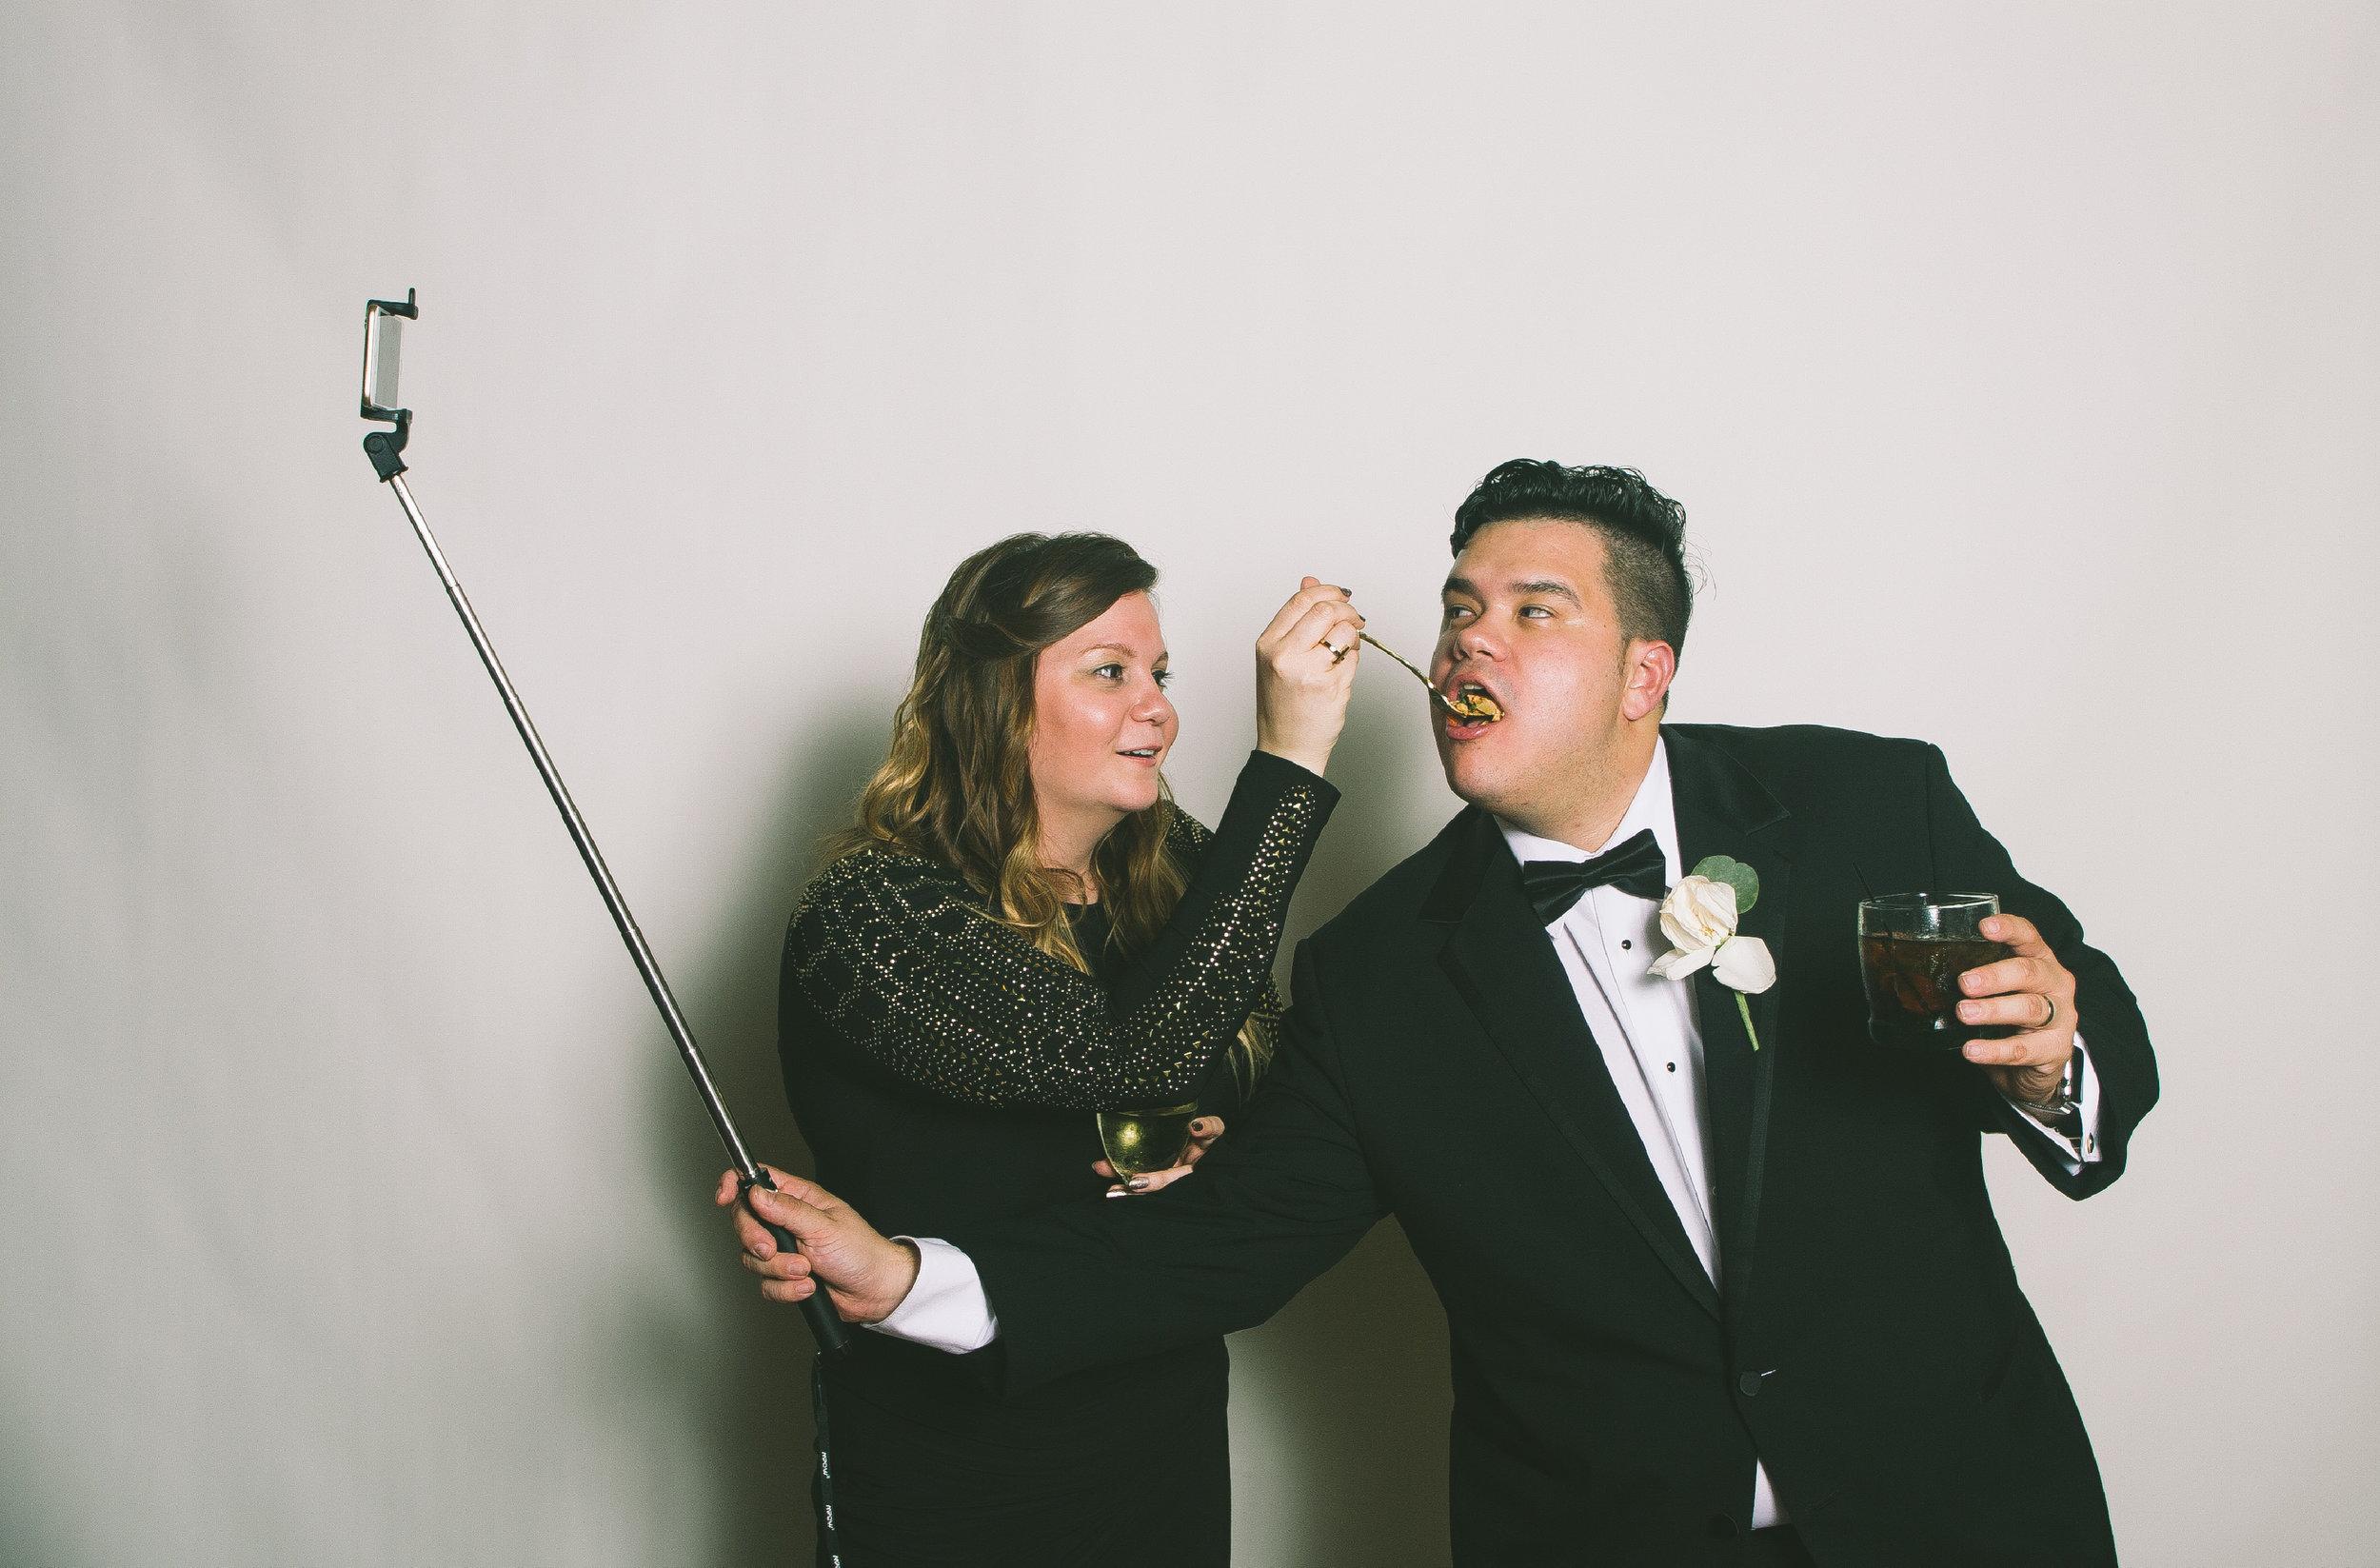 Marelys + Oscar Wedding Wackybooth Photobooth12.jpg